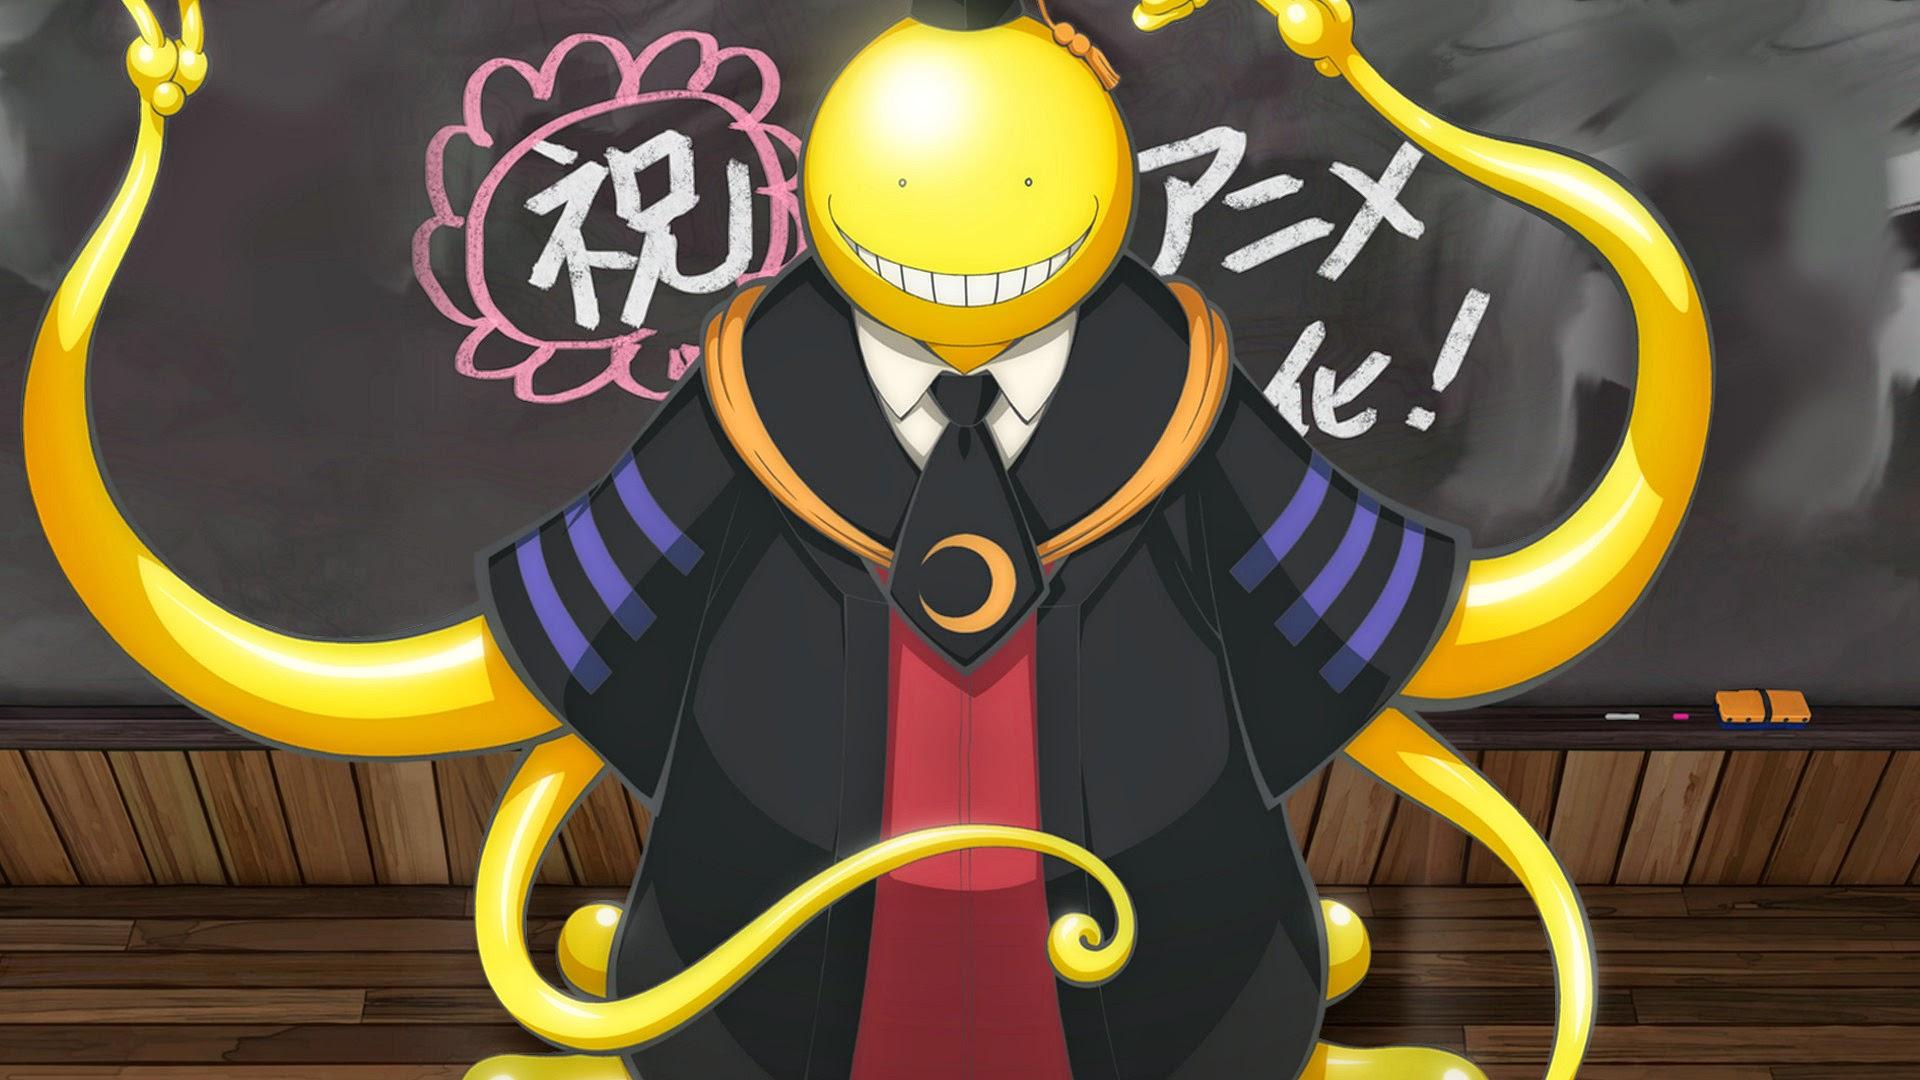 Nauczyciel-ośmiornica z anime Ansatsu Kyoushitsu